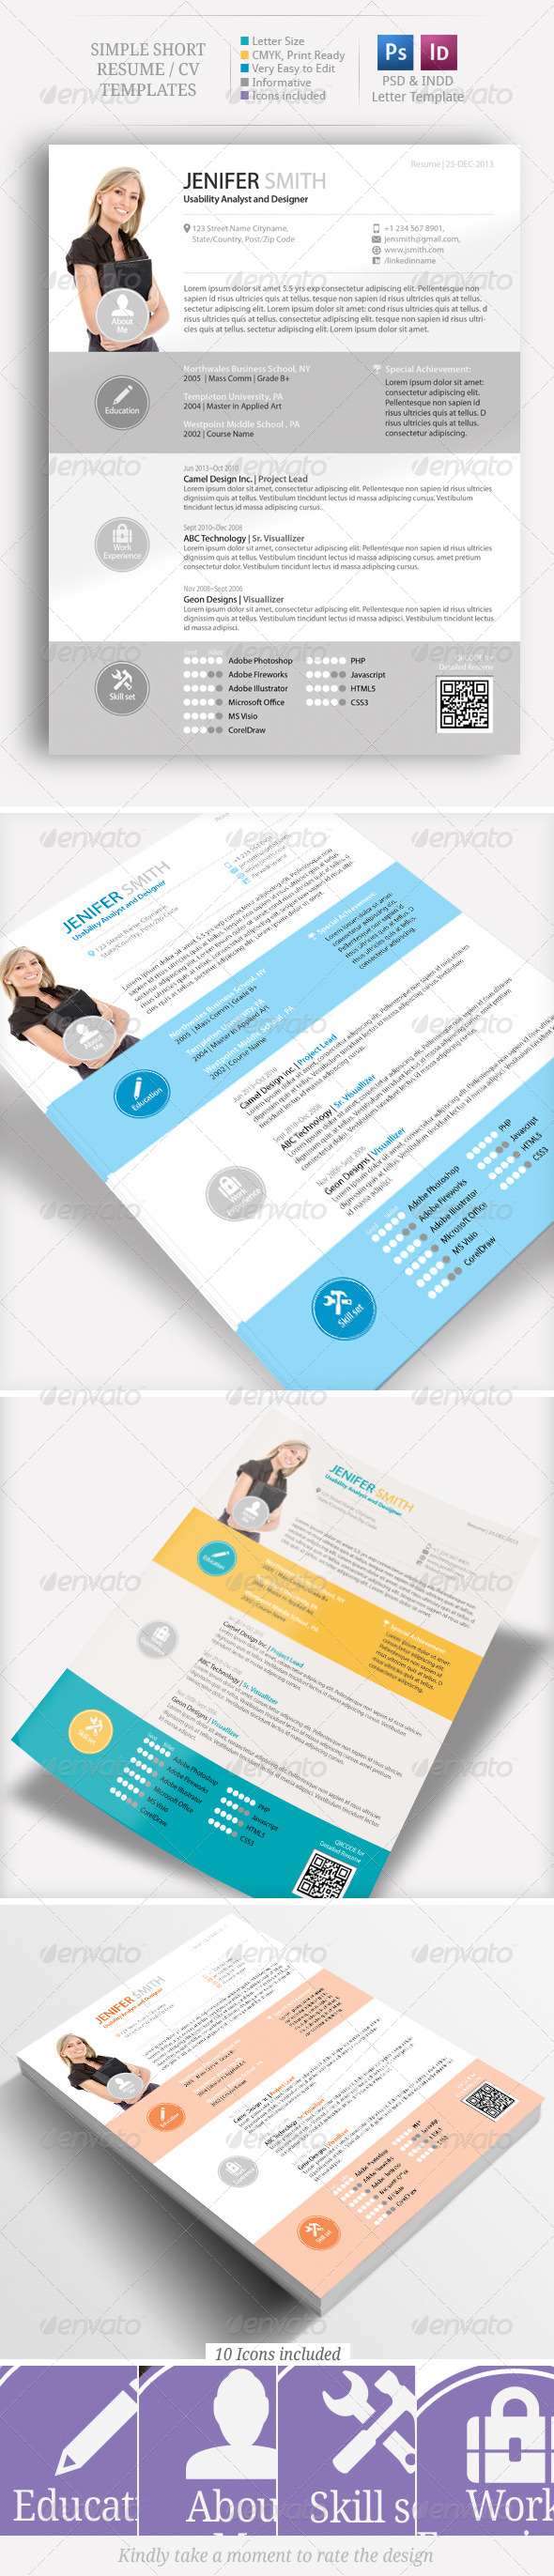 GraphicRiver Simple Short CV Resume Set 6319197